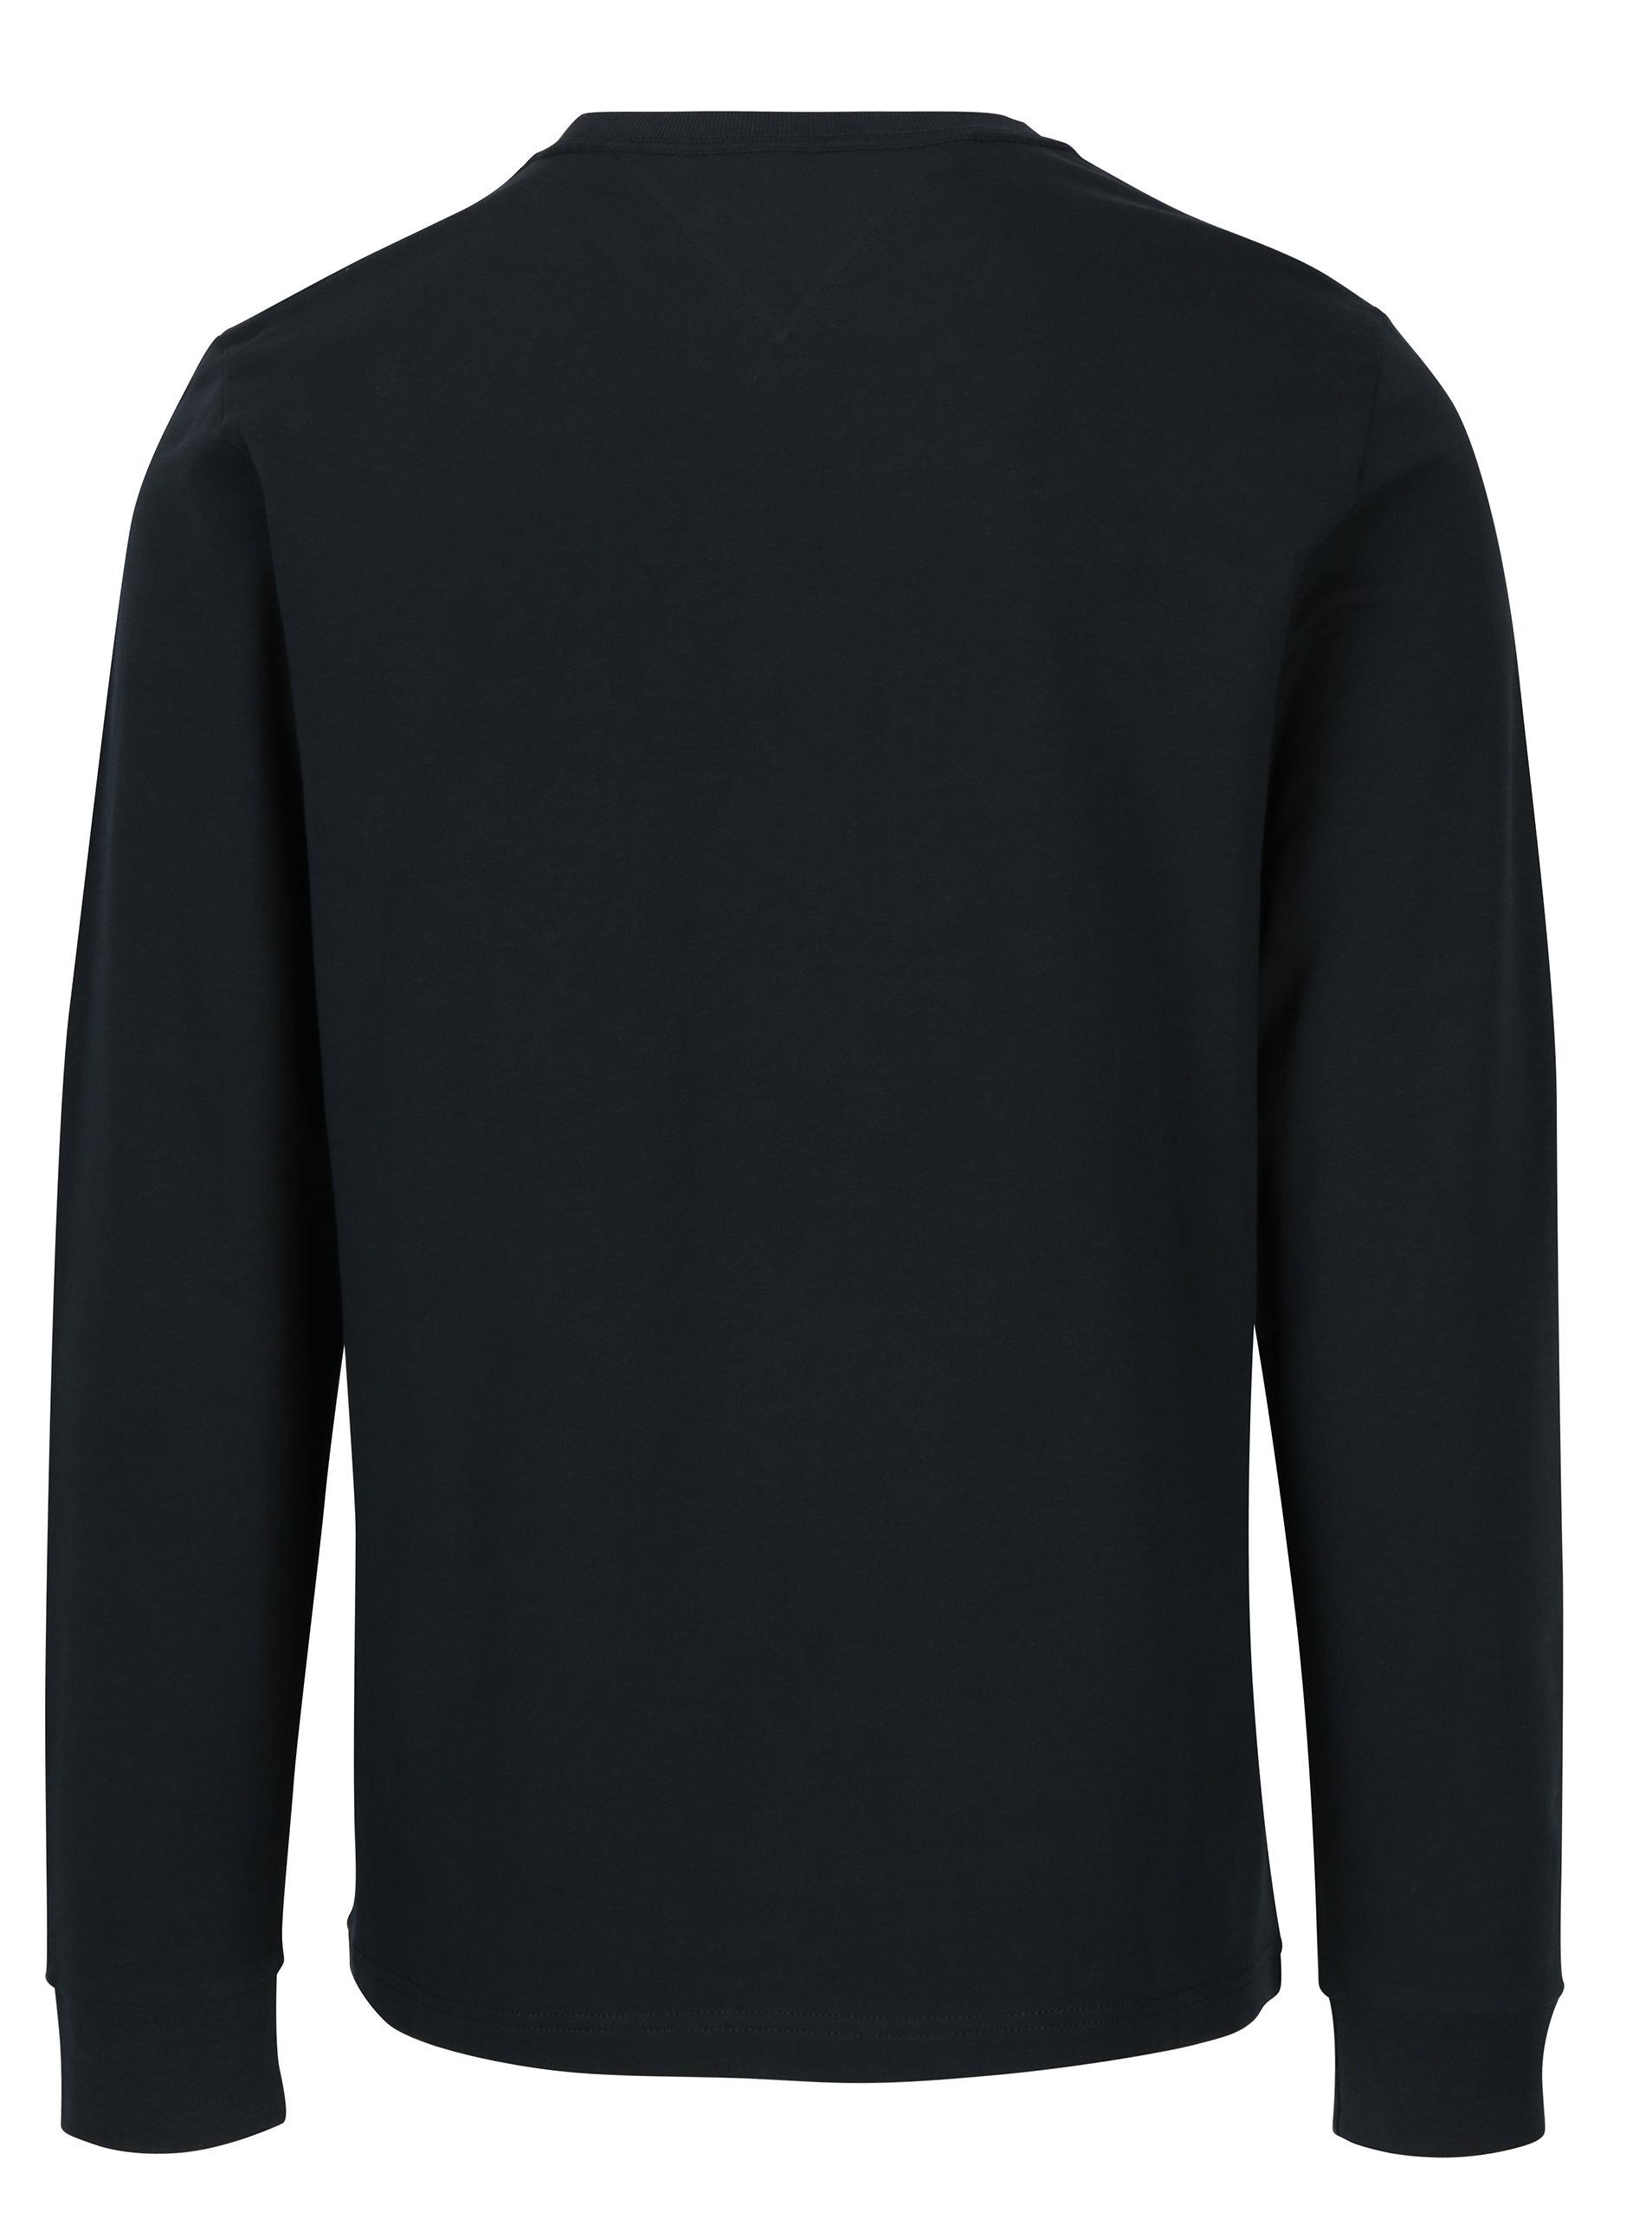 d4321e57fa Tmavomodré pánske tričko s dlhým rukávom a nášivkou Tommy Hilfiger Allen ...